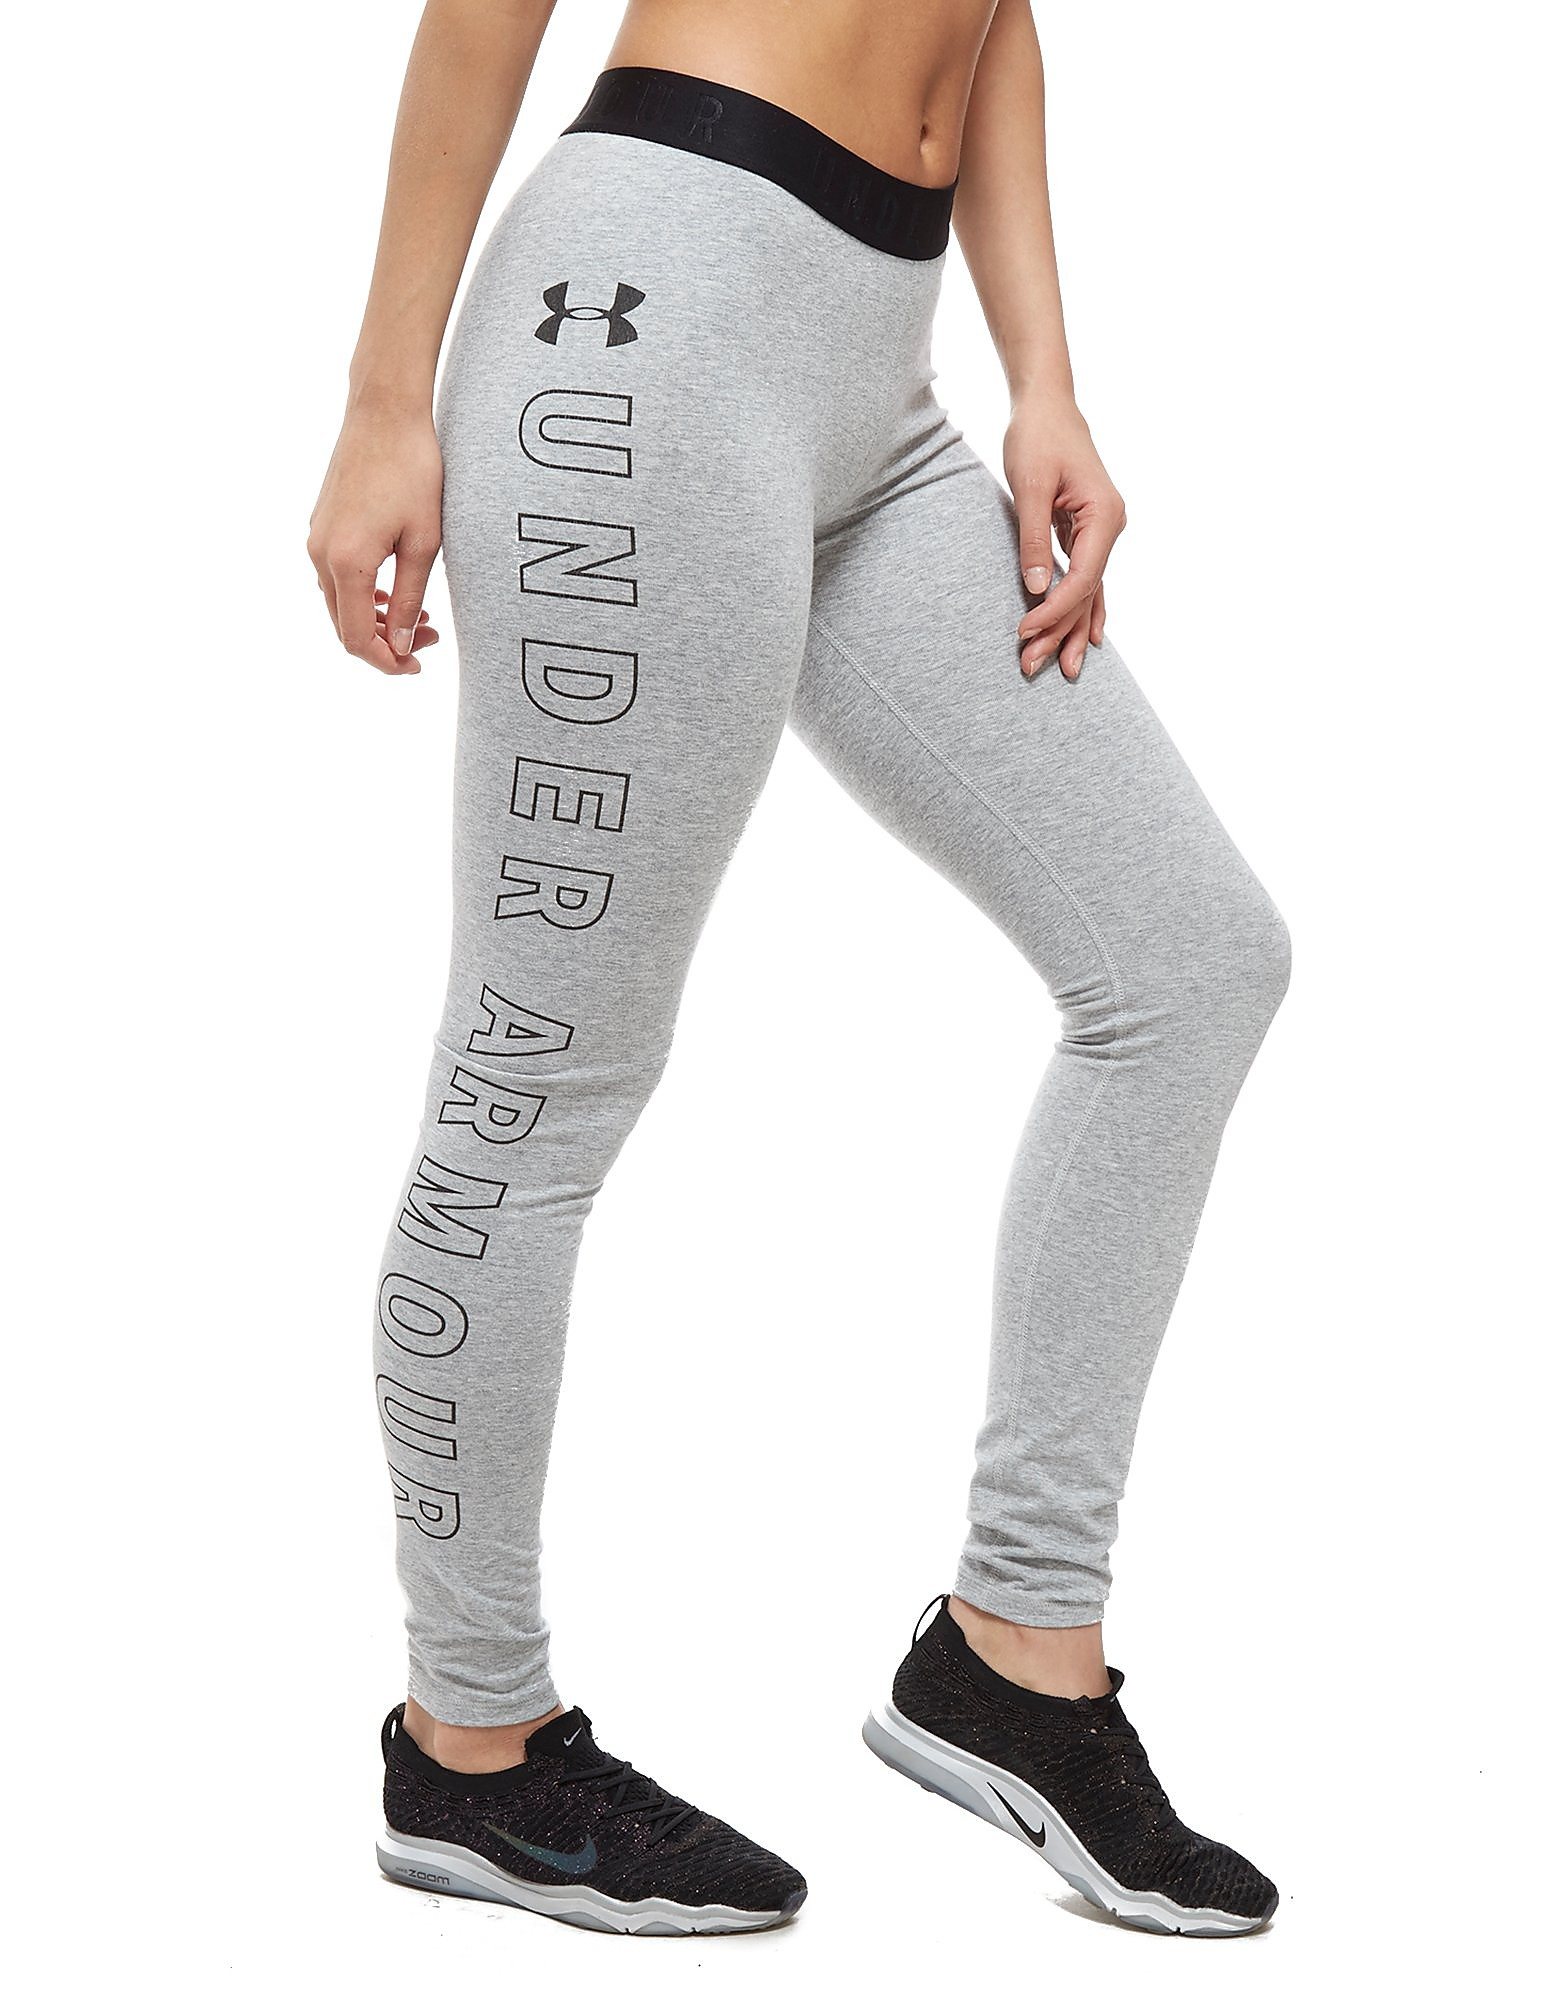 Under Armour Legging Favourite Graphic Femme - Grey/Black, Grey/Black